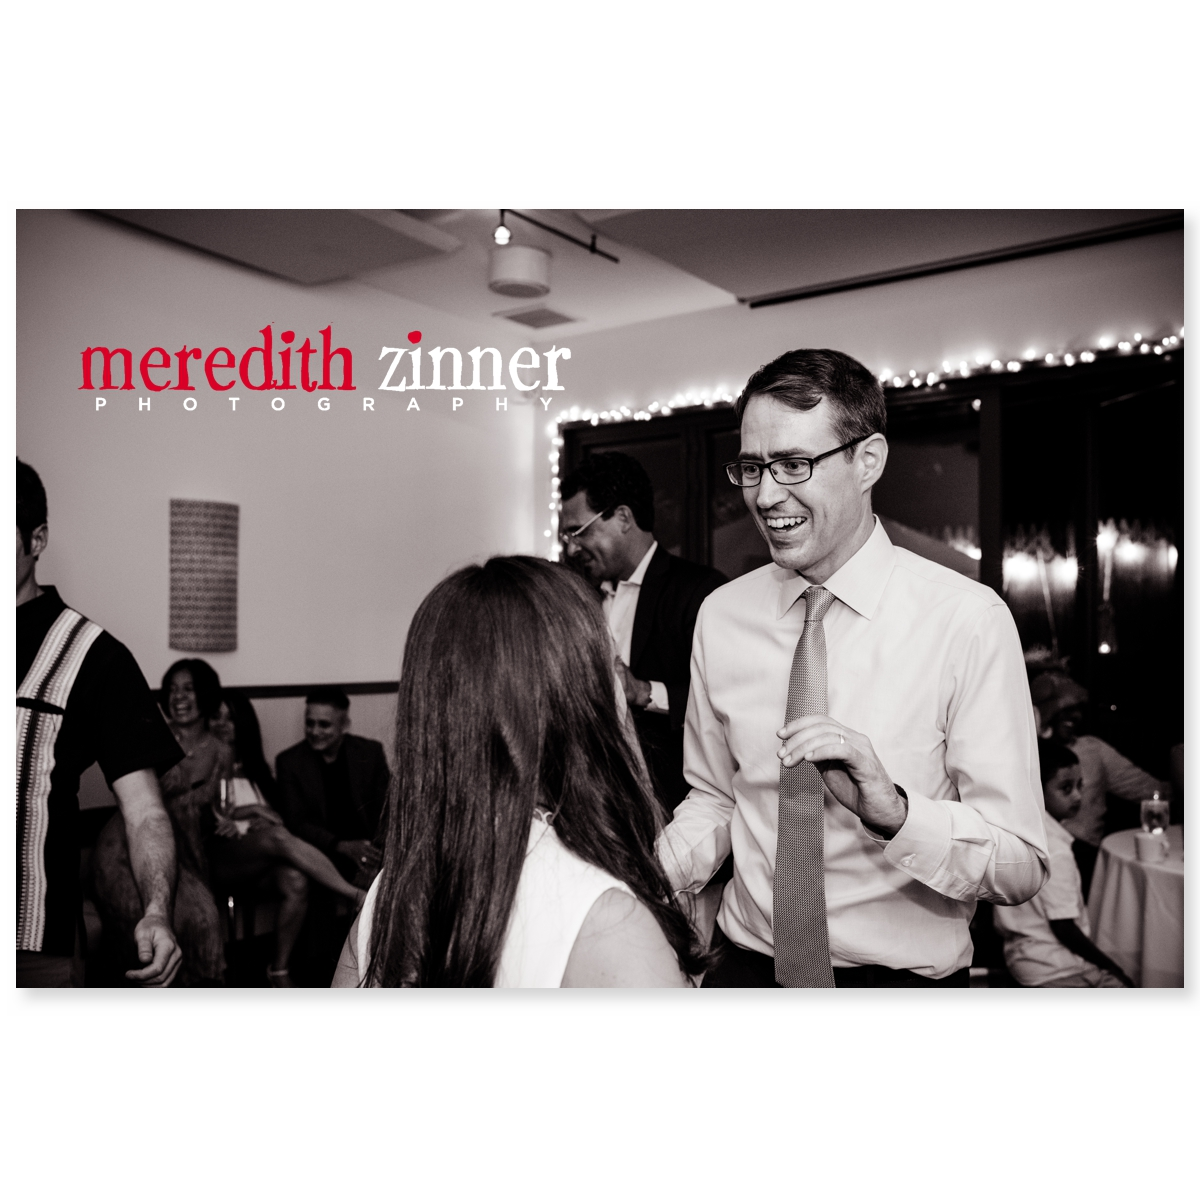 Meredith_Zinner_Photography_StilesCelebration_0407